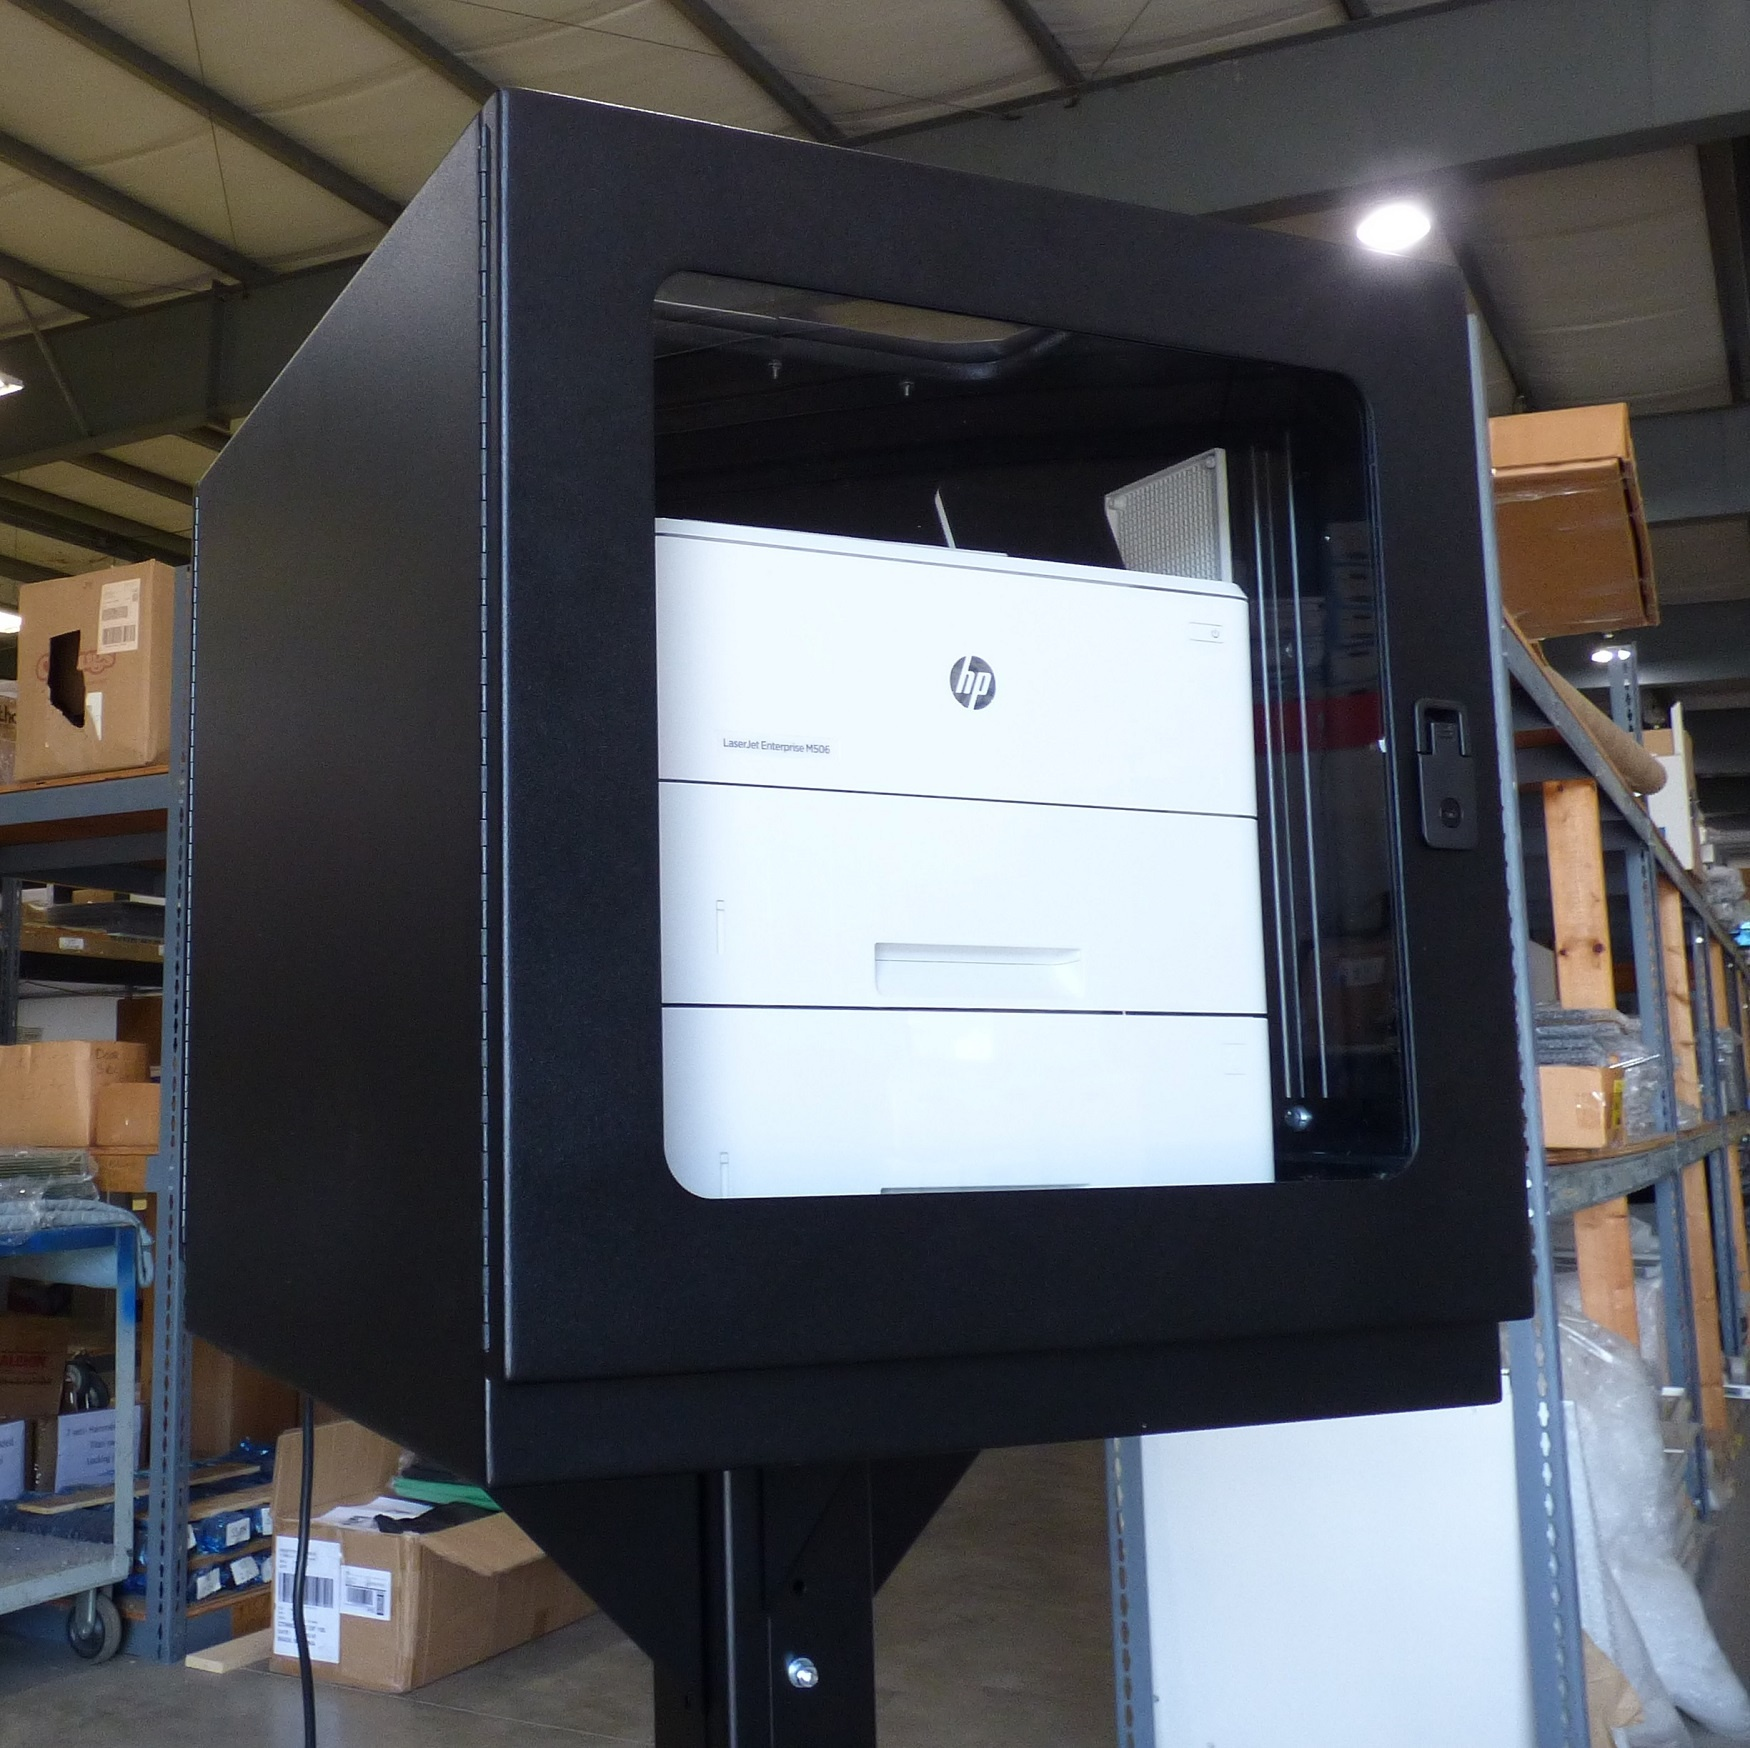 PB262426-12 Printer Box Enclosure with HP Printer IceStation ITSENCLOSURES